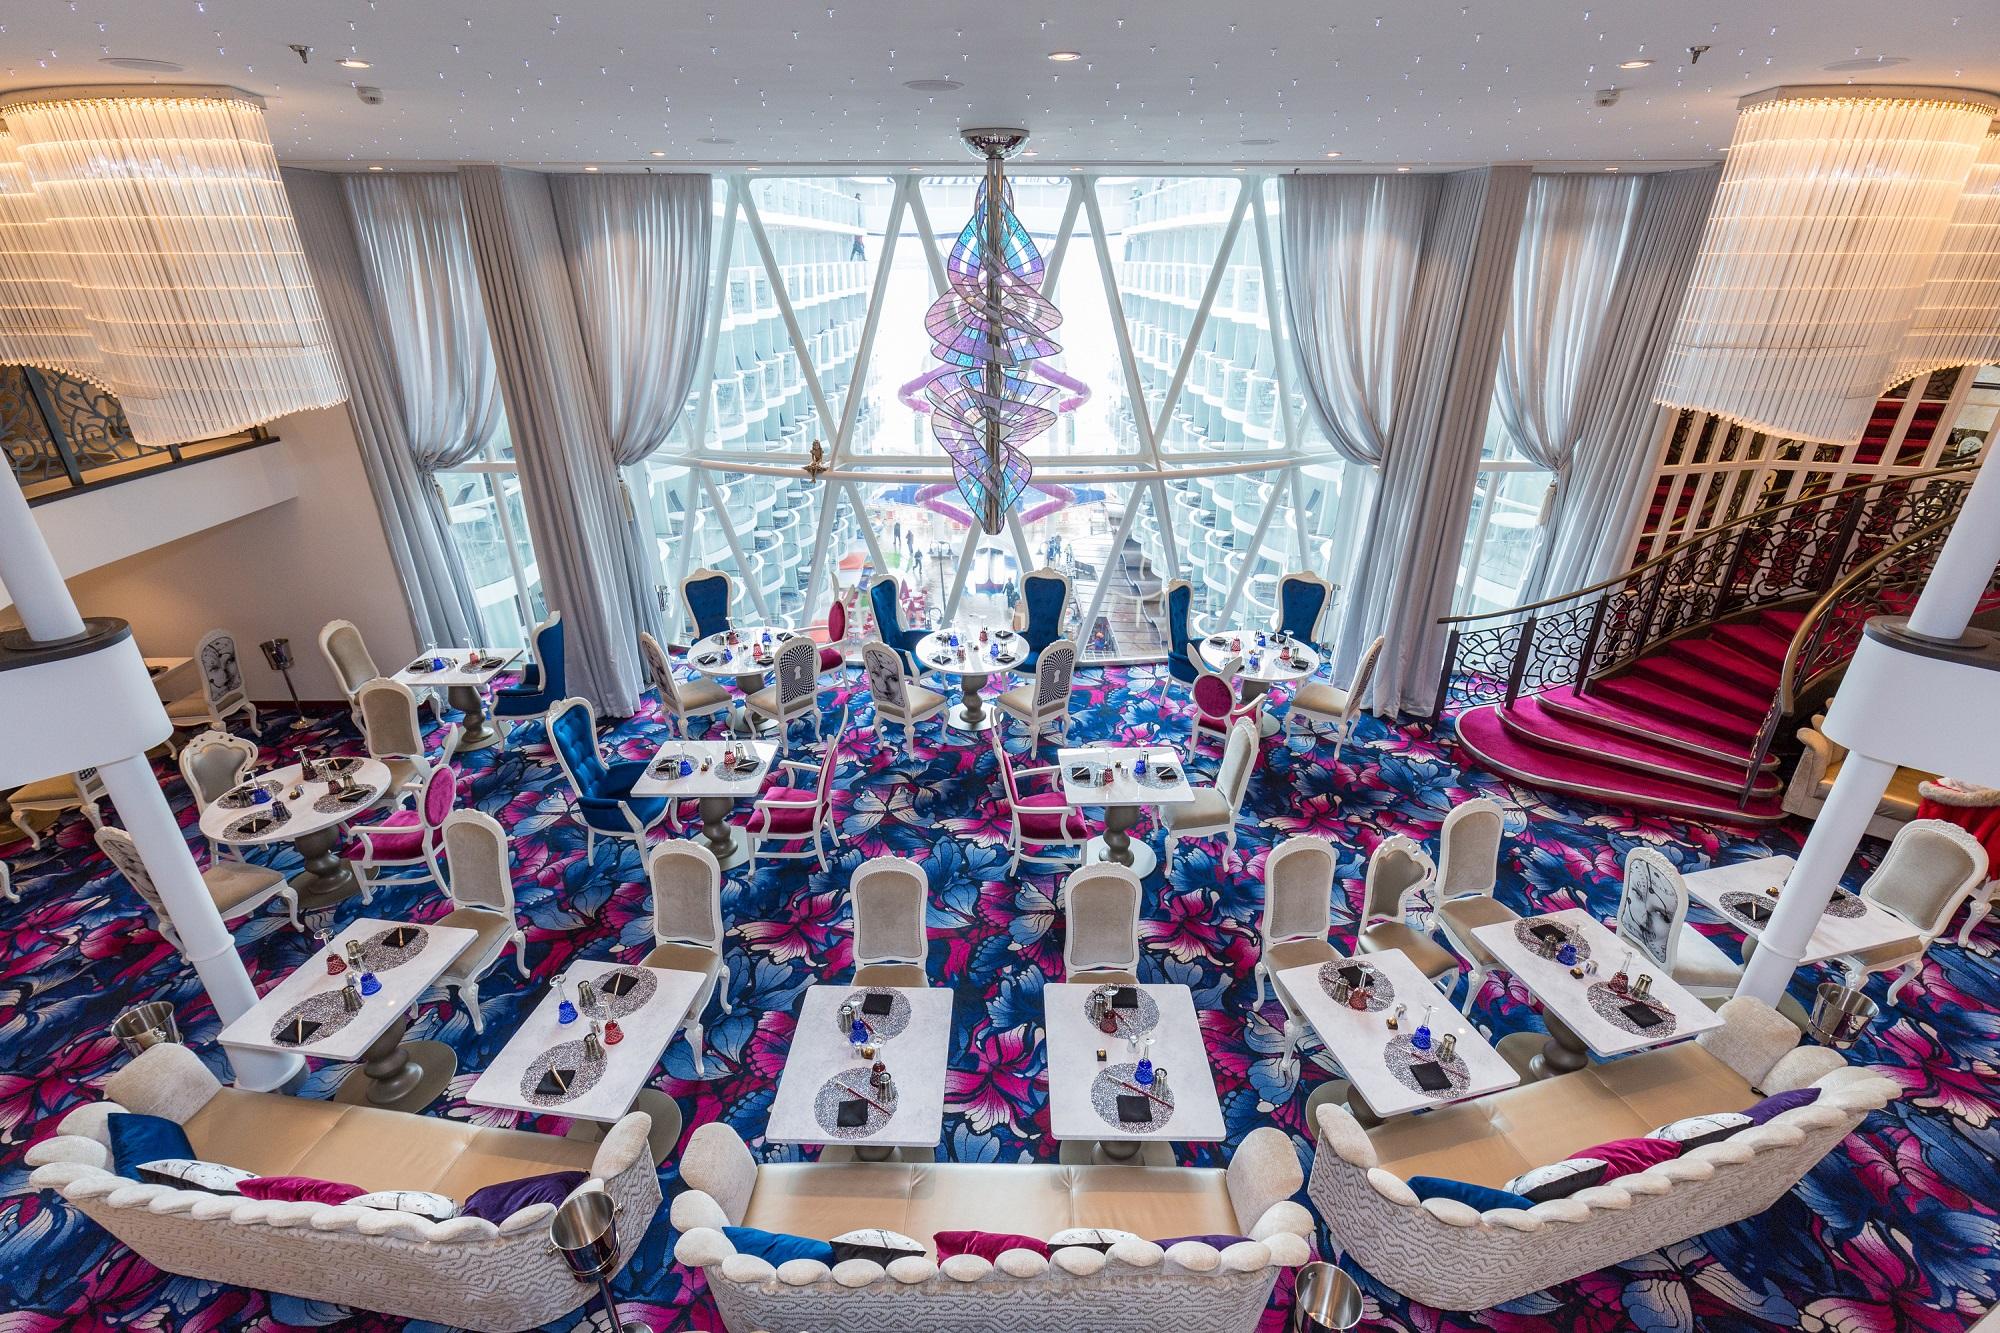 Inside Wonderland on Symphony of the Seas